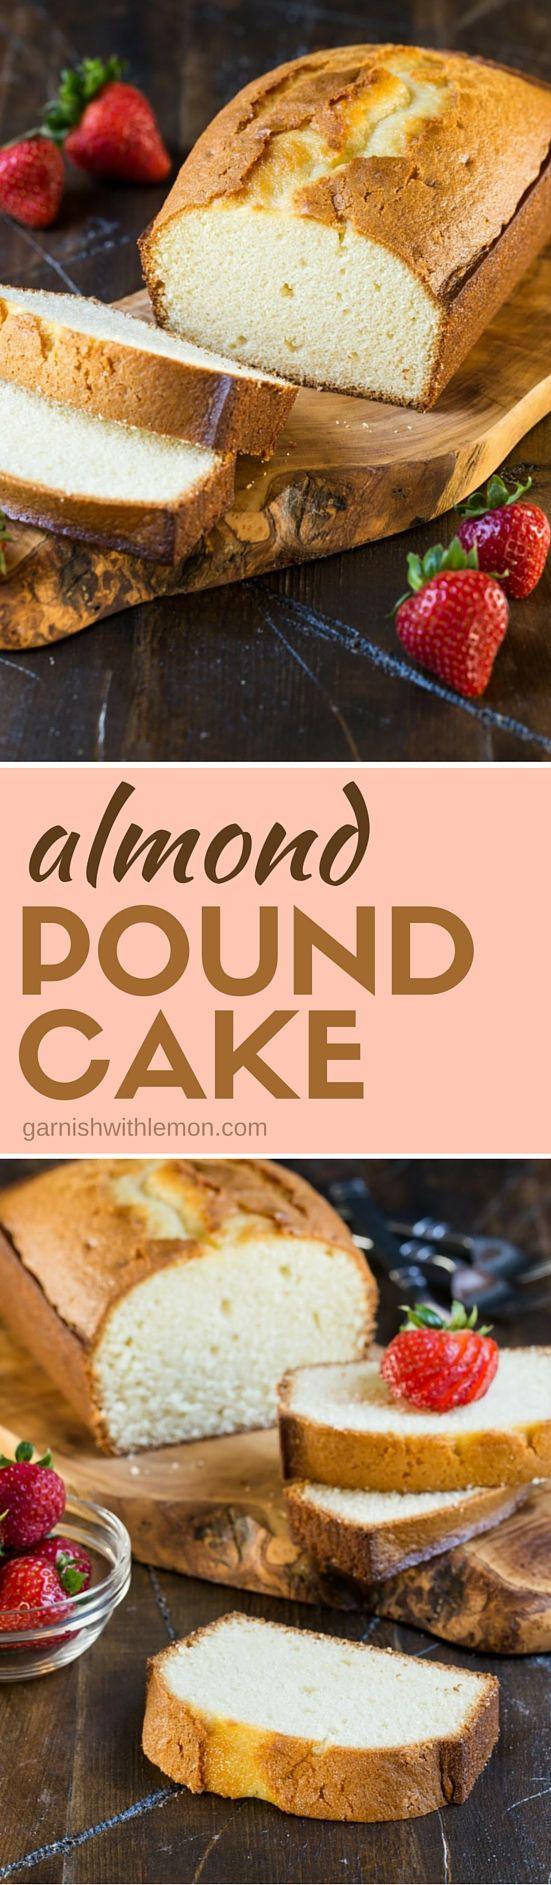 Almond pound cake recipe almond paste